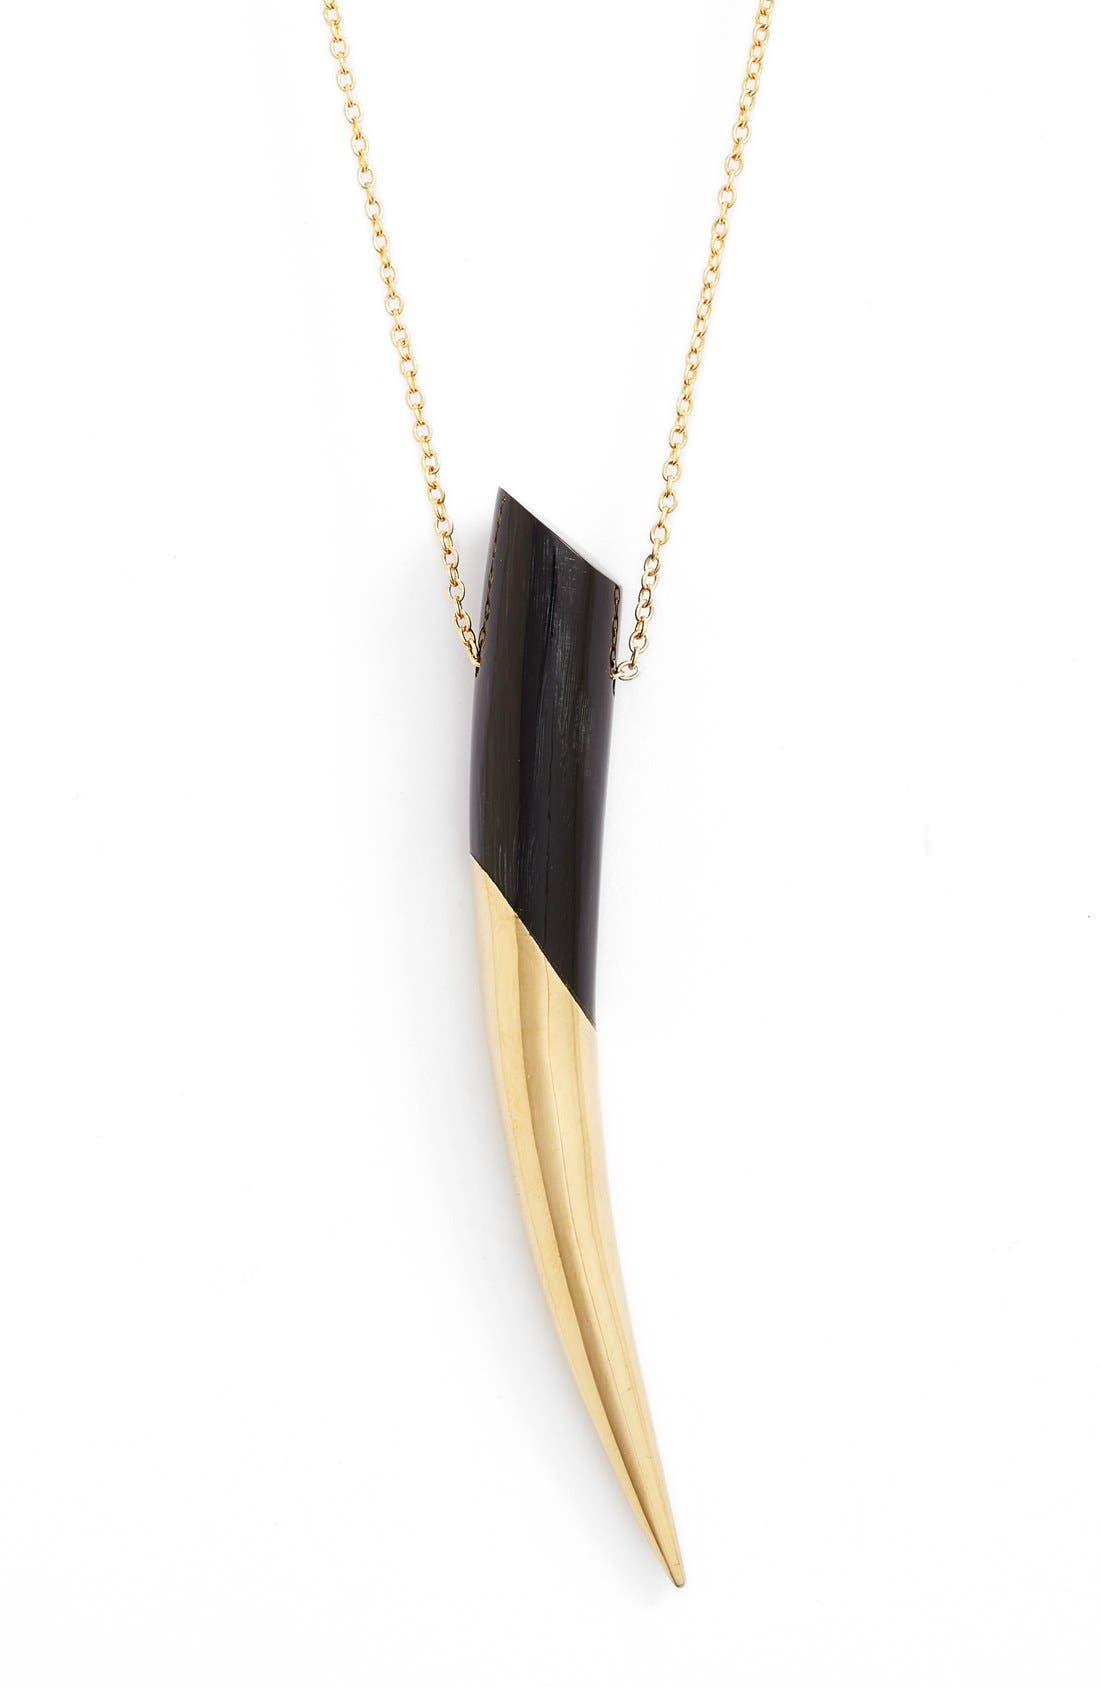 Dalili Horn Pendant Necklace,                             Alternate thumbnail 2, color,                             005